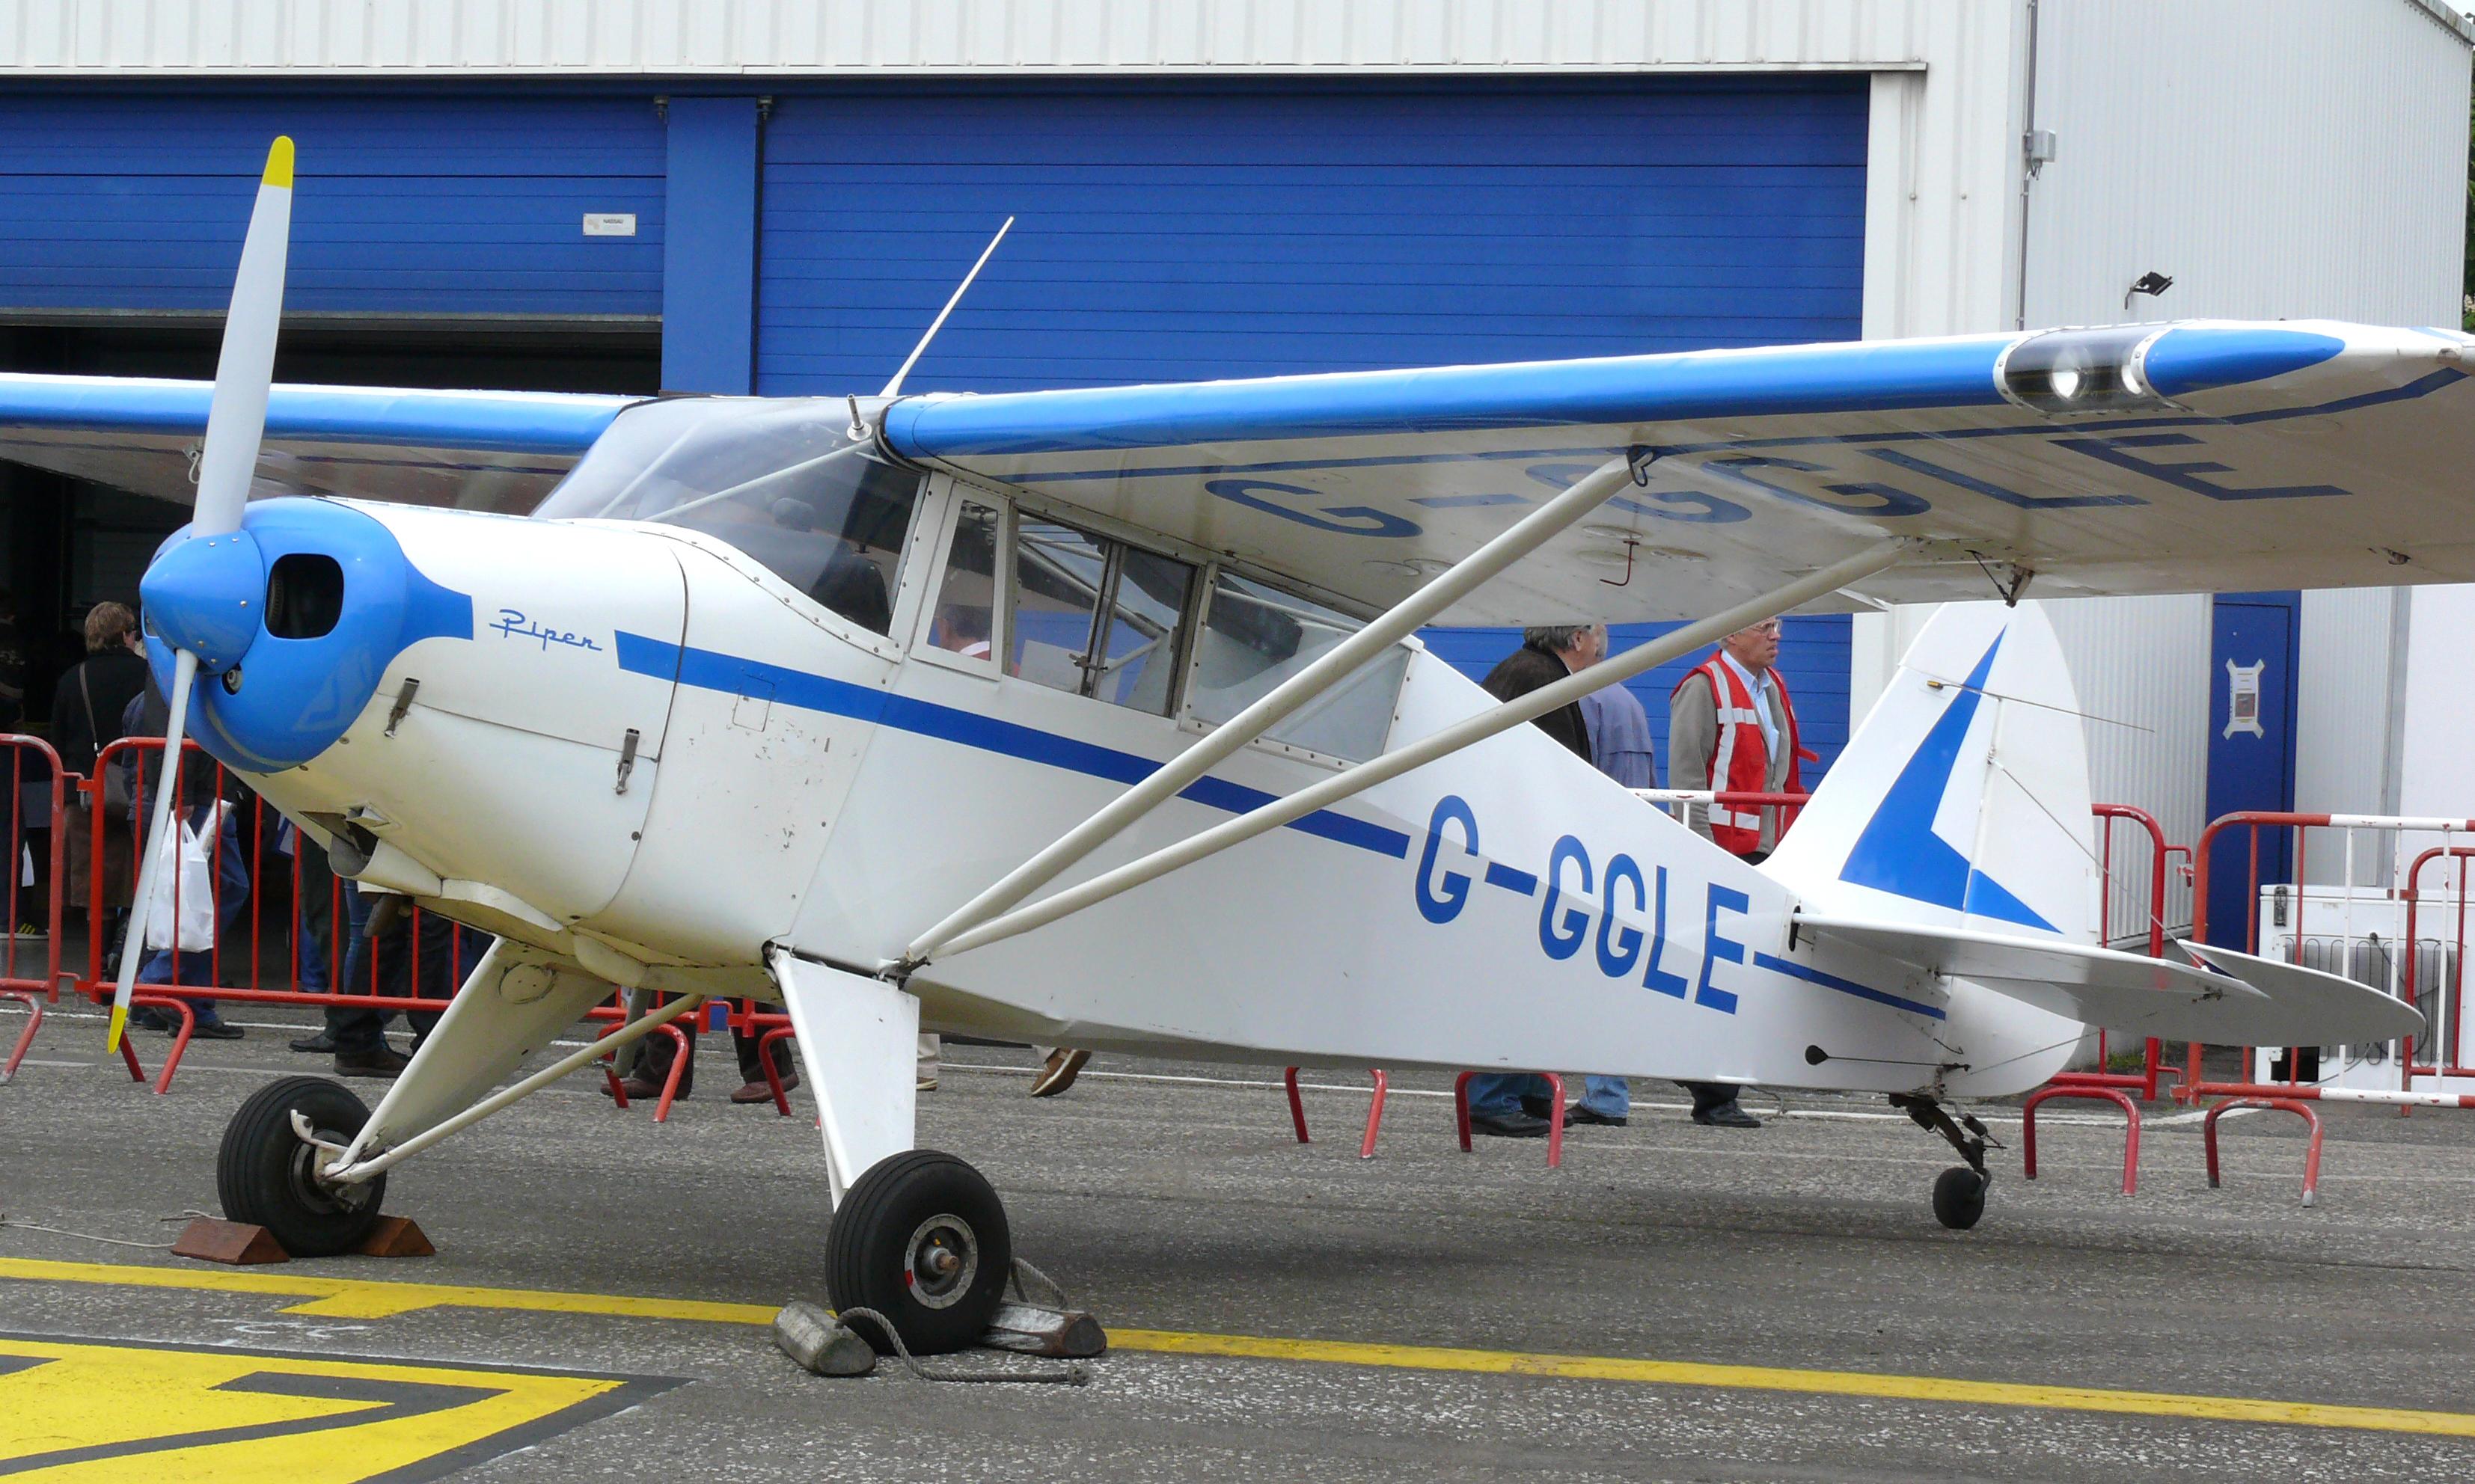 File:Piper PA 22 Colt jpg - Wikimedia Commons